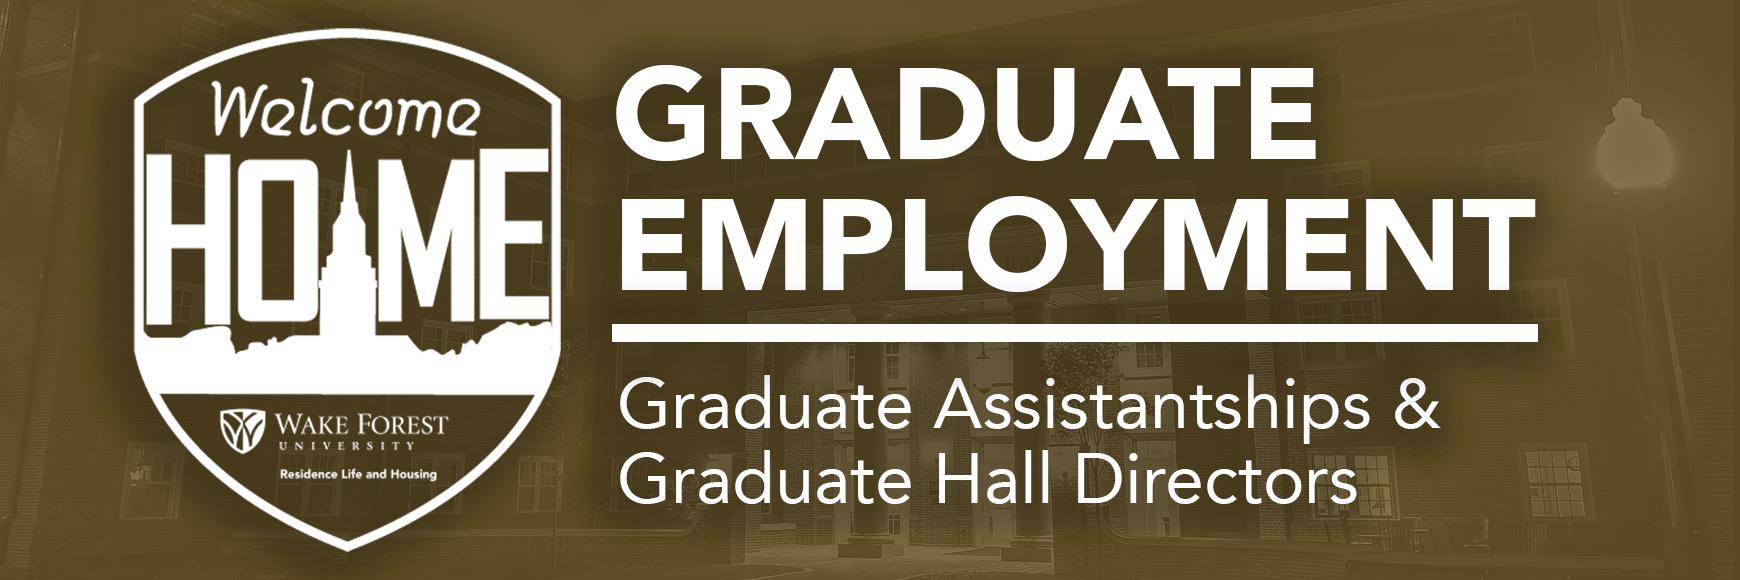 Graduate Employment: Graduate Assistantships and Graduate Hall Directors